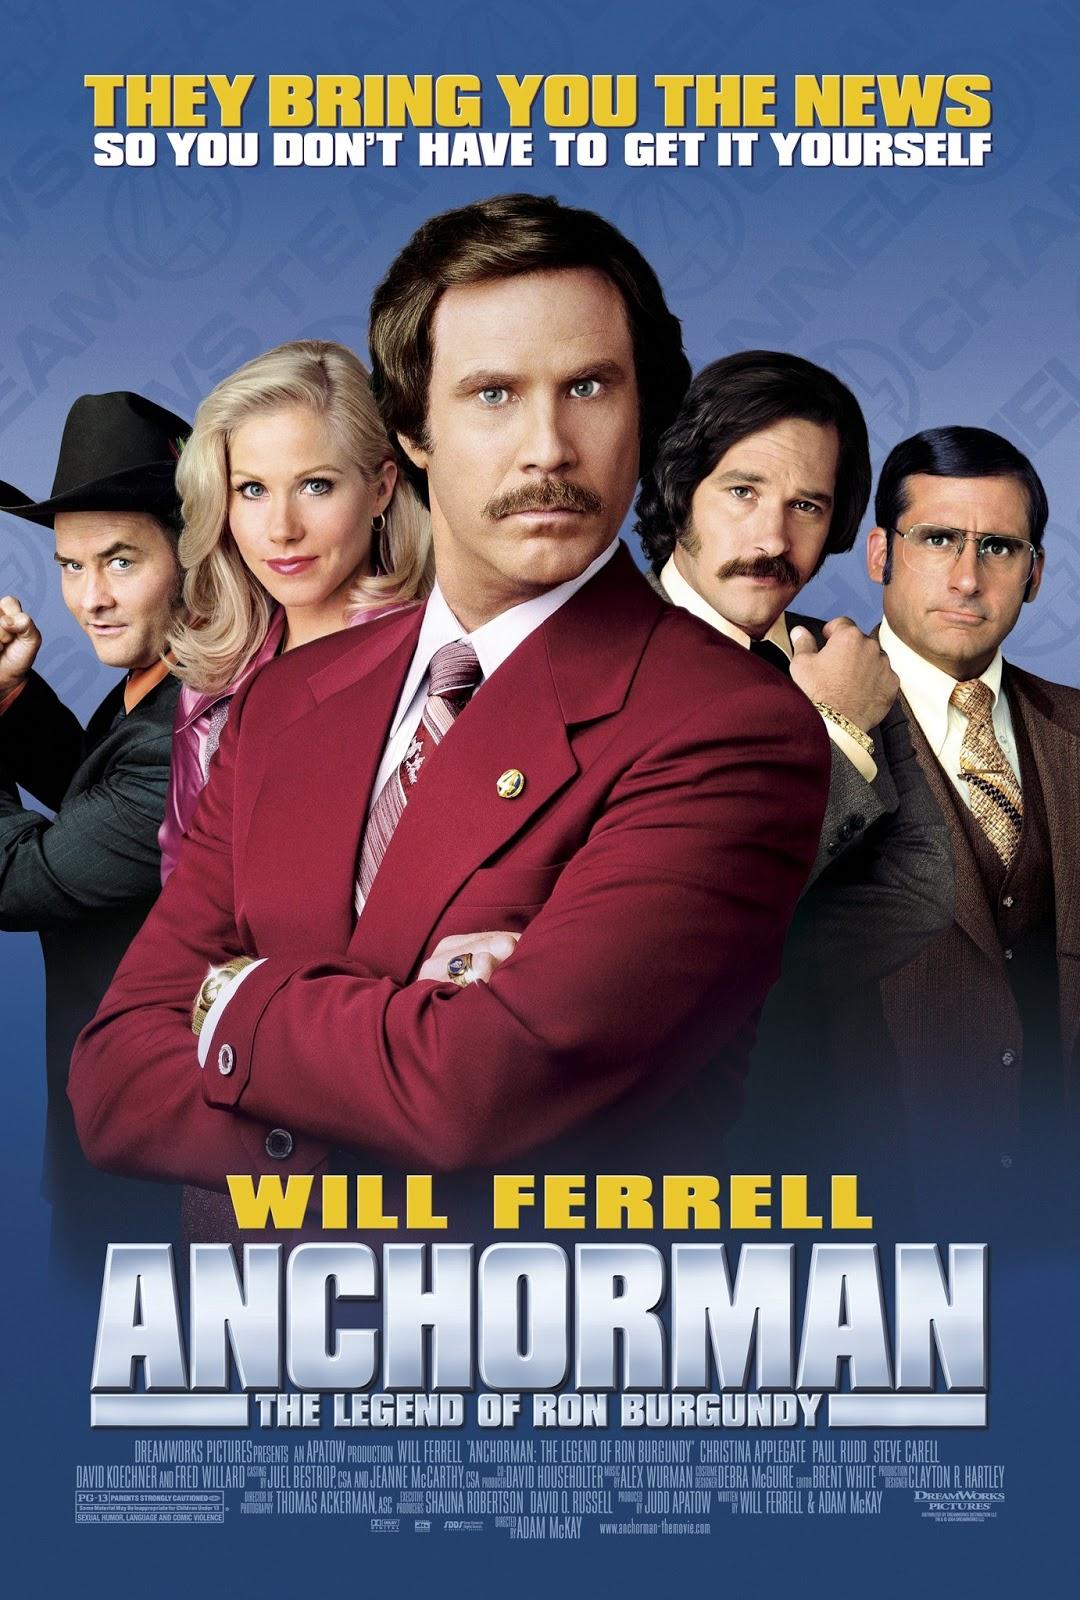 Anchorman: The Legend of Ron Burgundy (2004) ประกาศรบ … แต่ดั้นนมาพบรัก